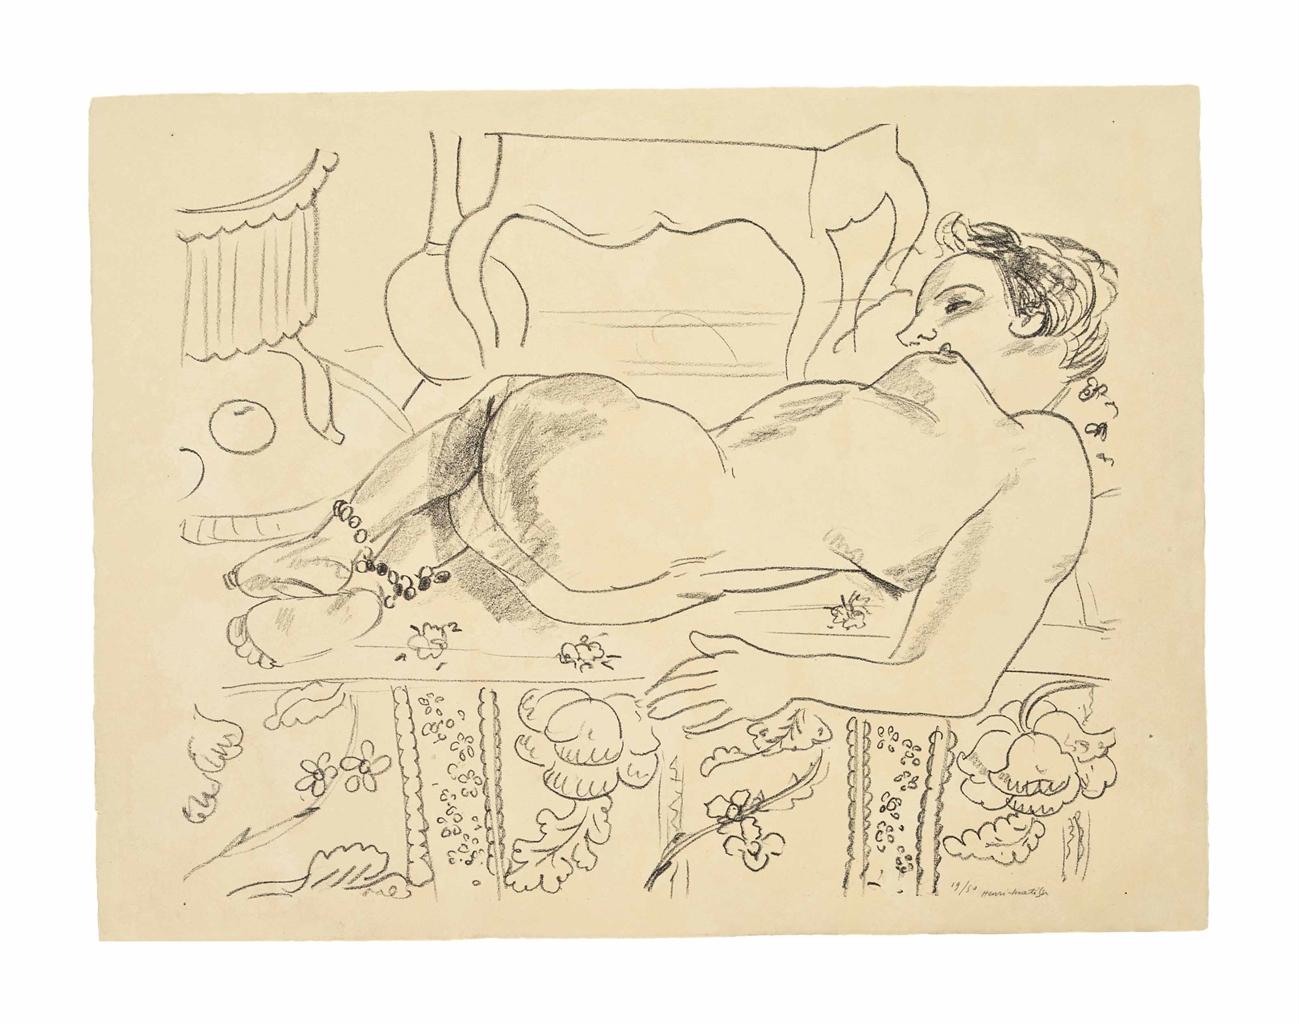 Henri Matisse-Nu couche sur sol fleuri-1929